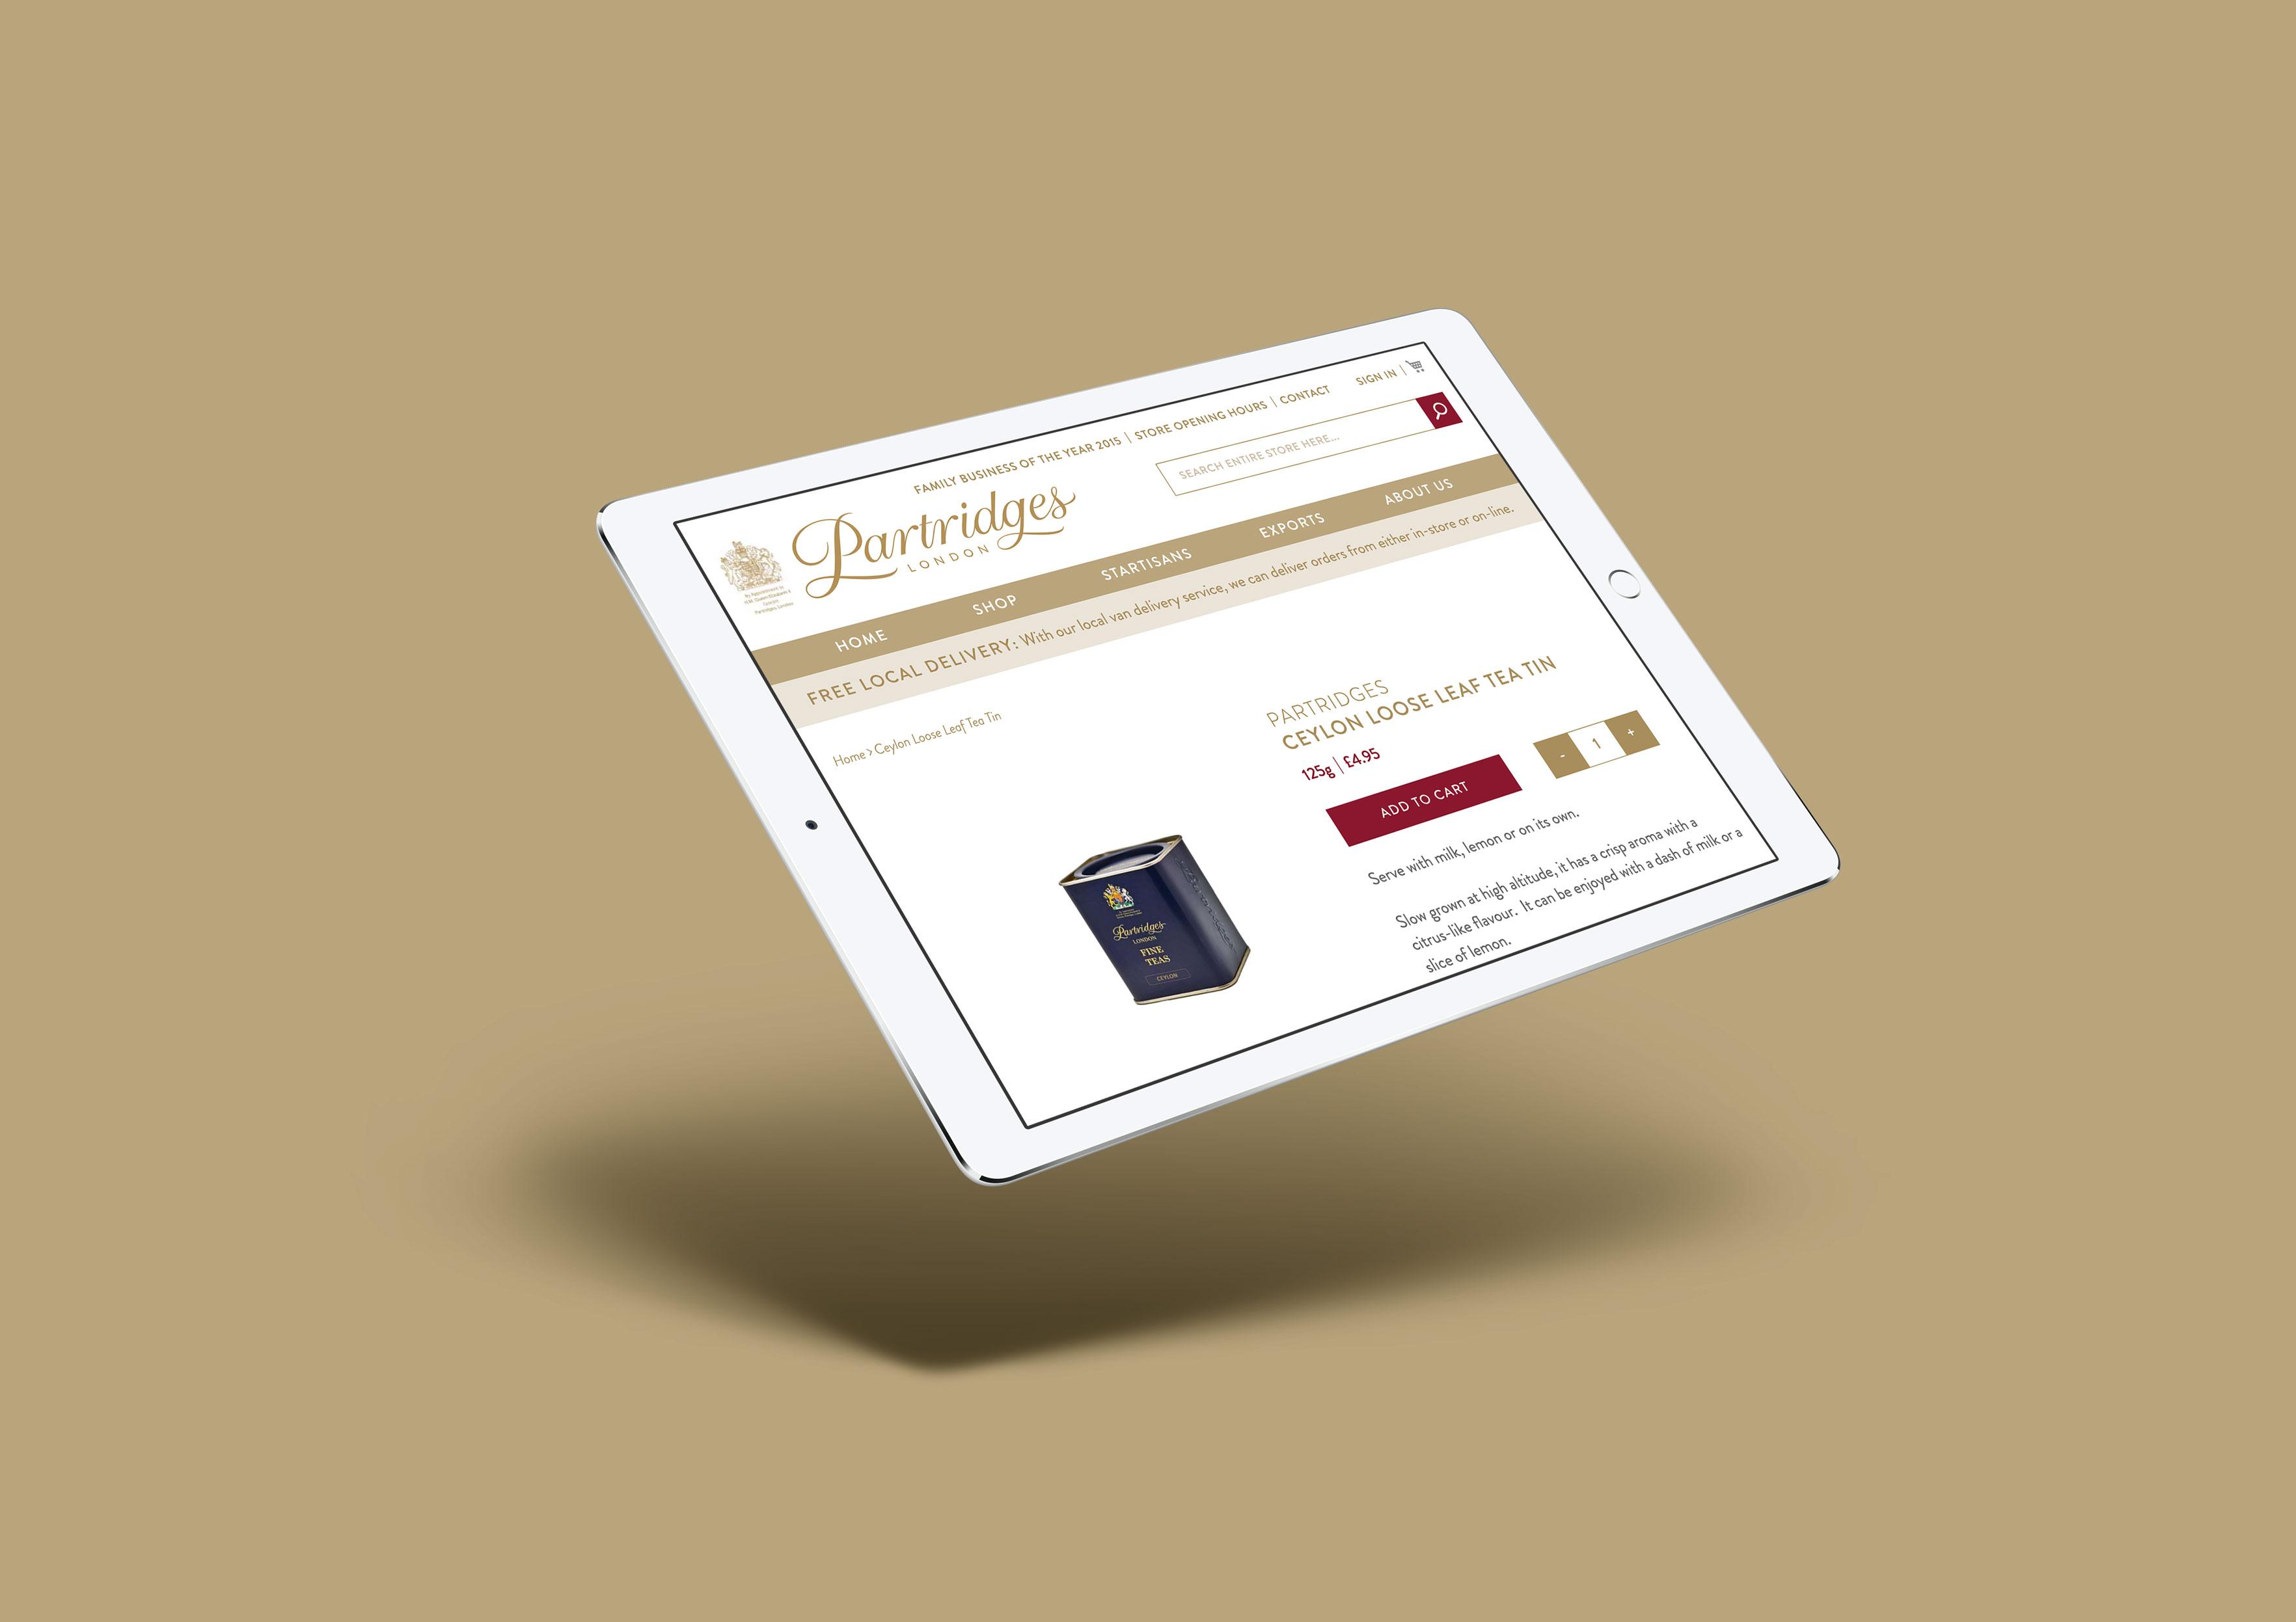 partridges mobile website for ecommerce